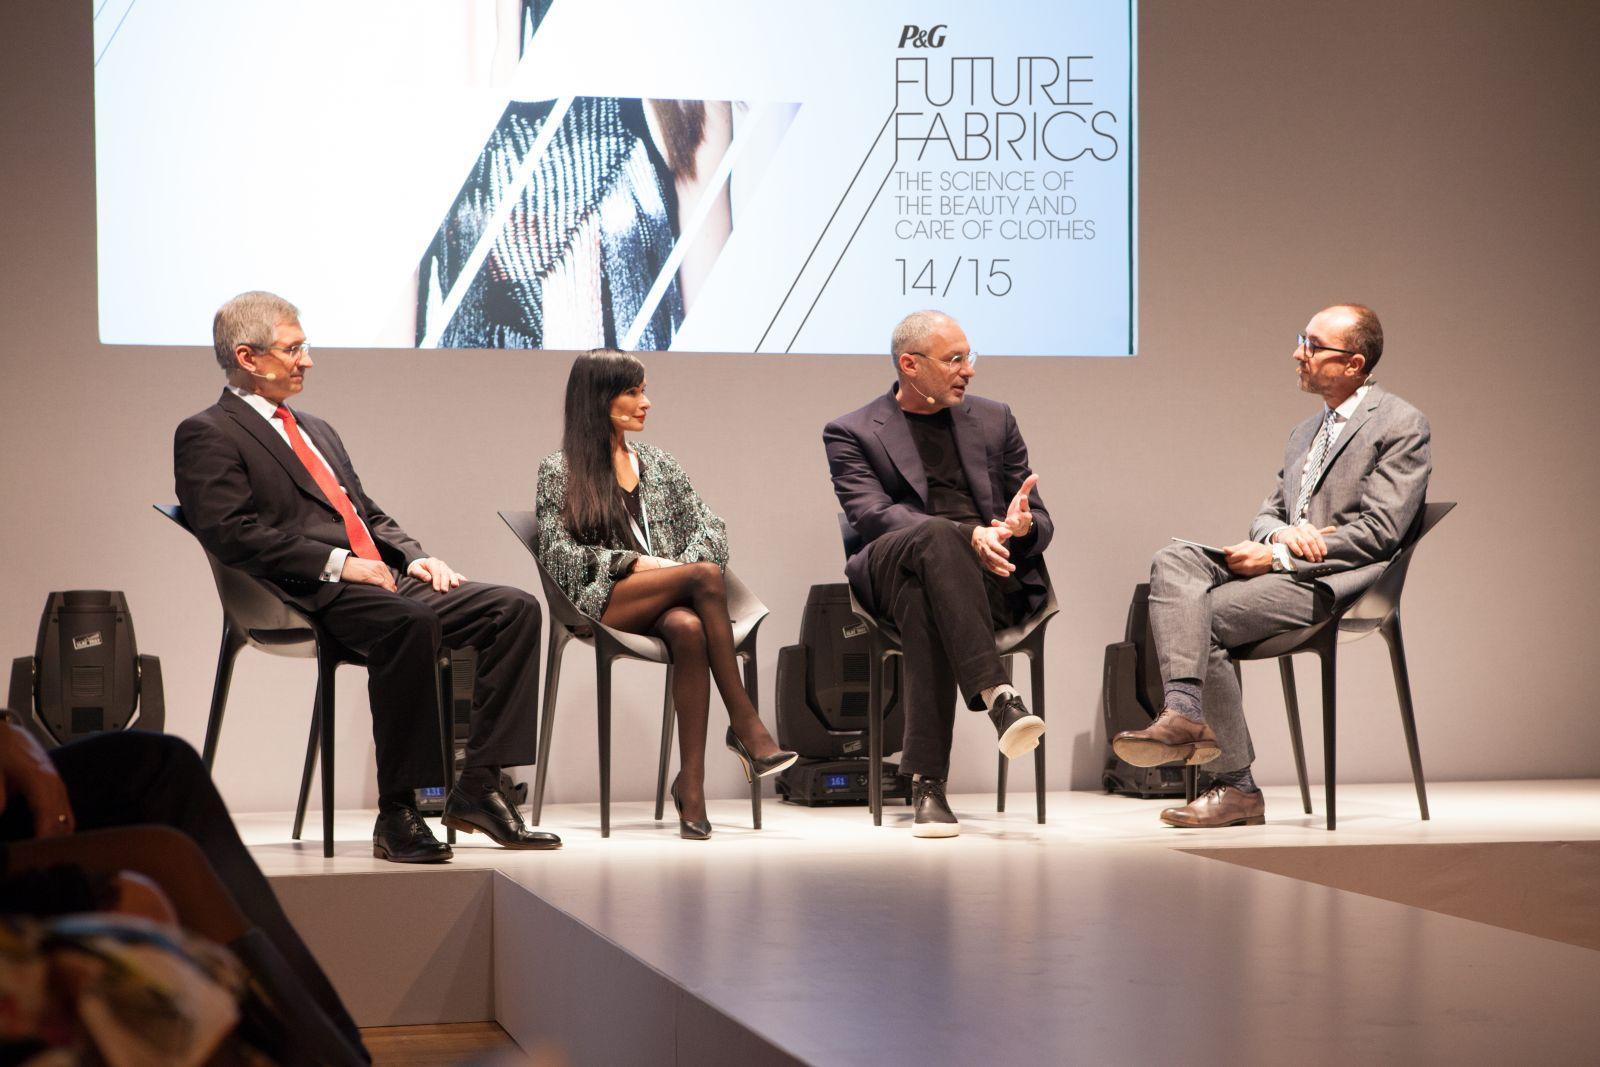 P&G Future Fabrics 2014